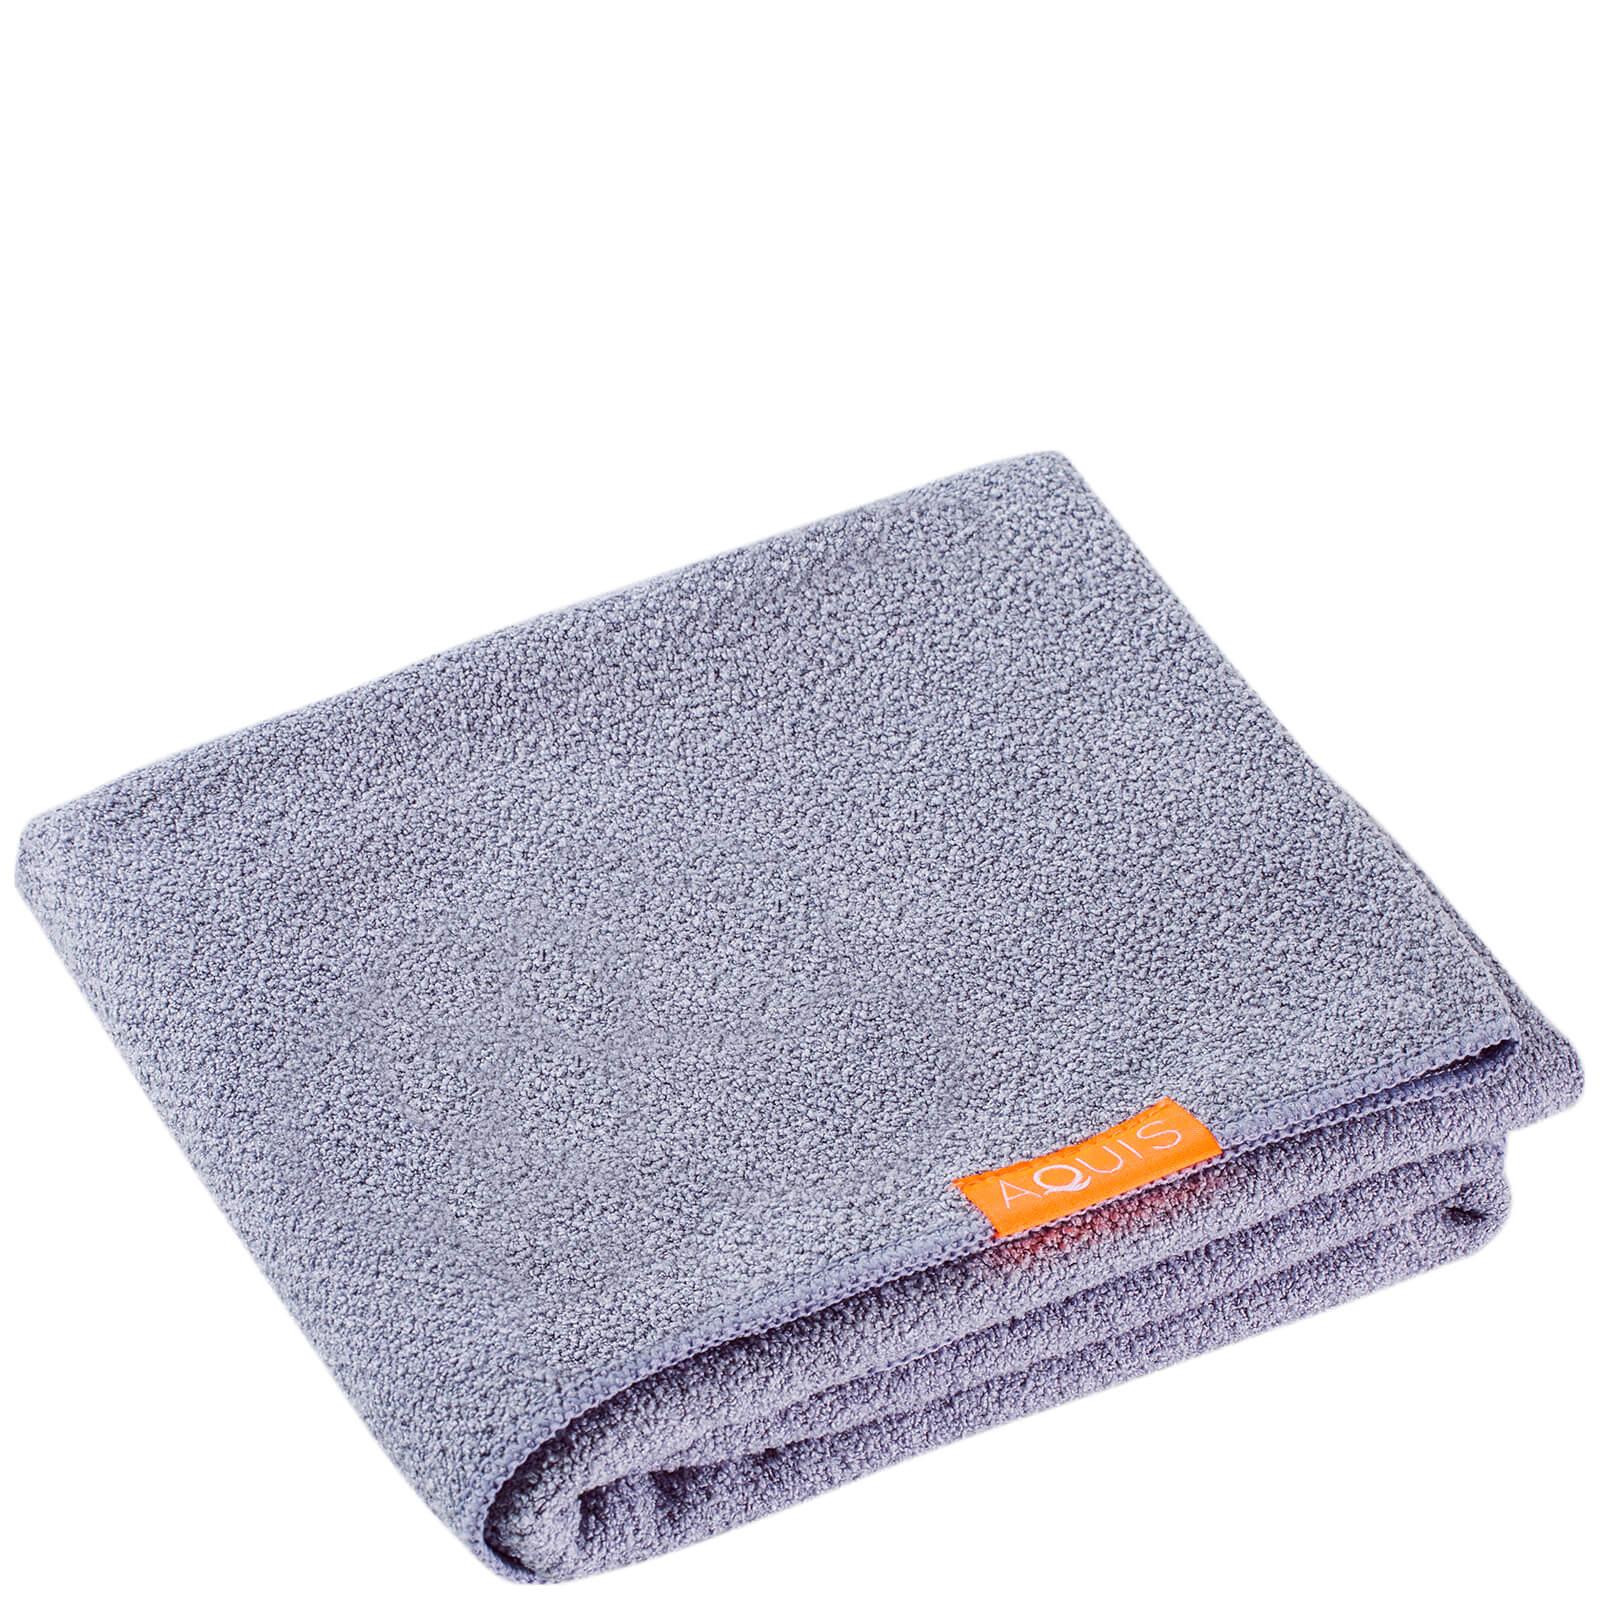 Купить Полотенце для сушки волос Aquis Hair Towel Lisse Luxe Cloudy Berry